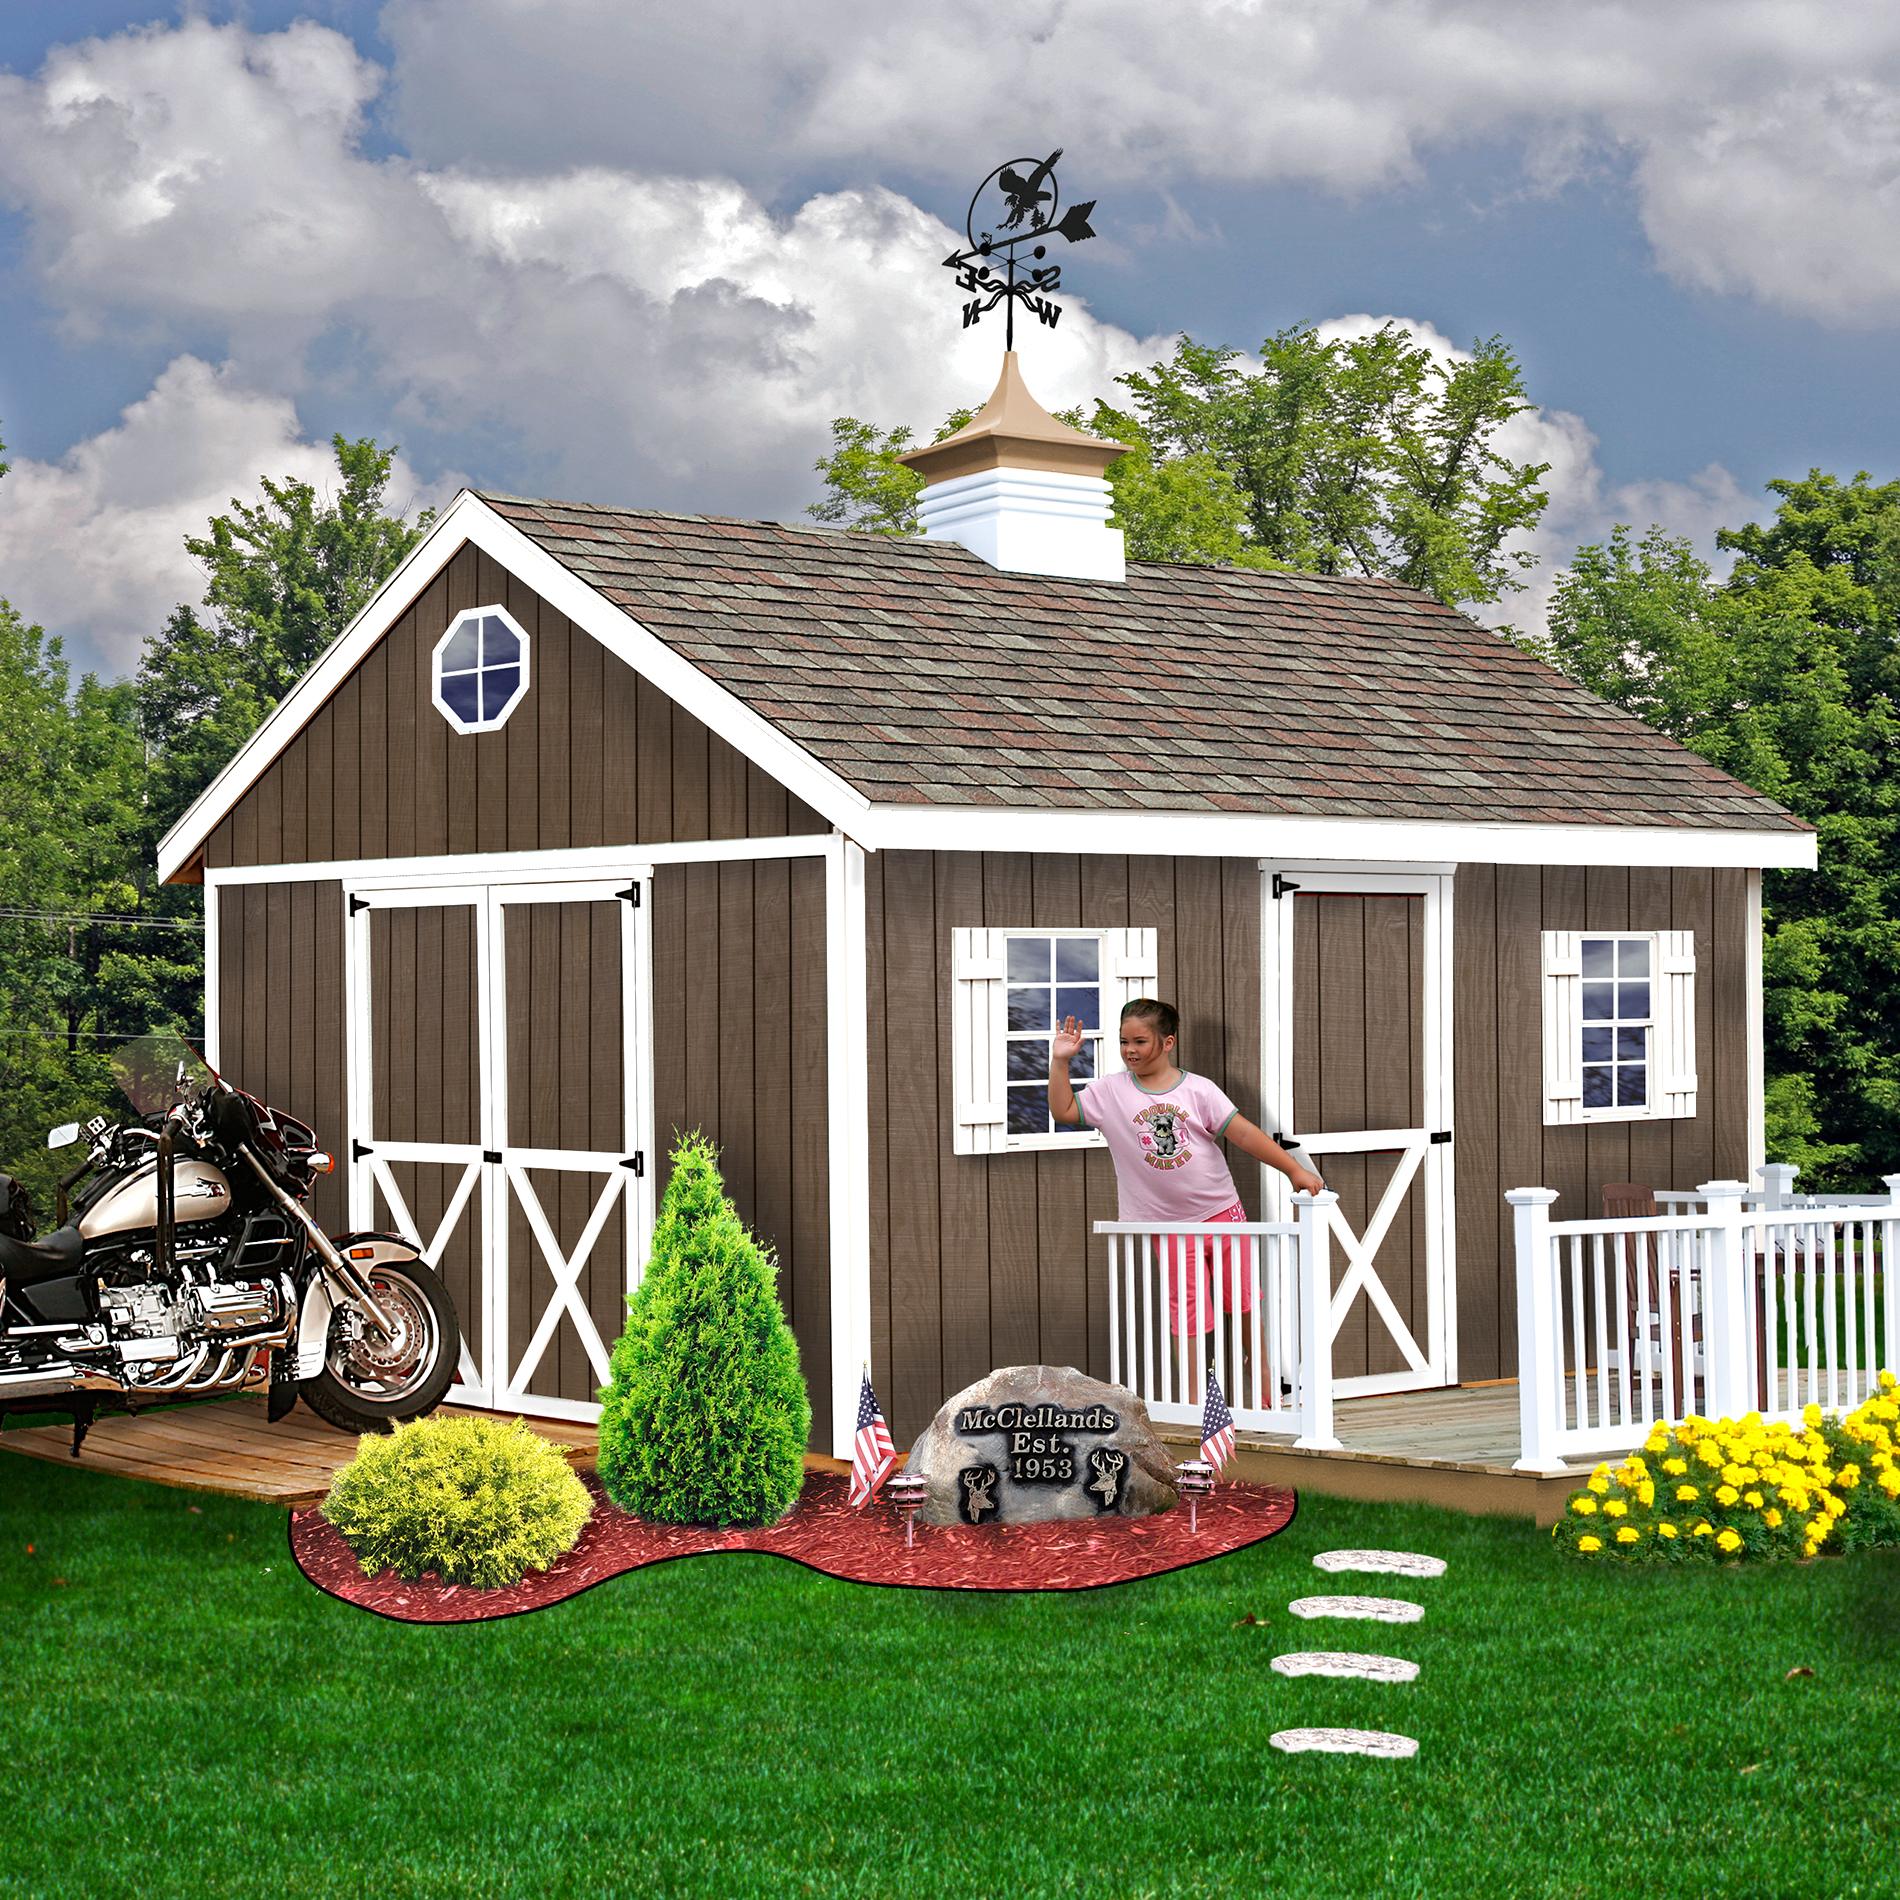 Best Barns Easton 12x20 Shed Kit Lawn Amp Garden Sheds